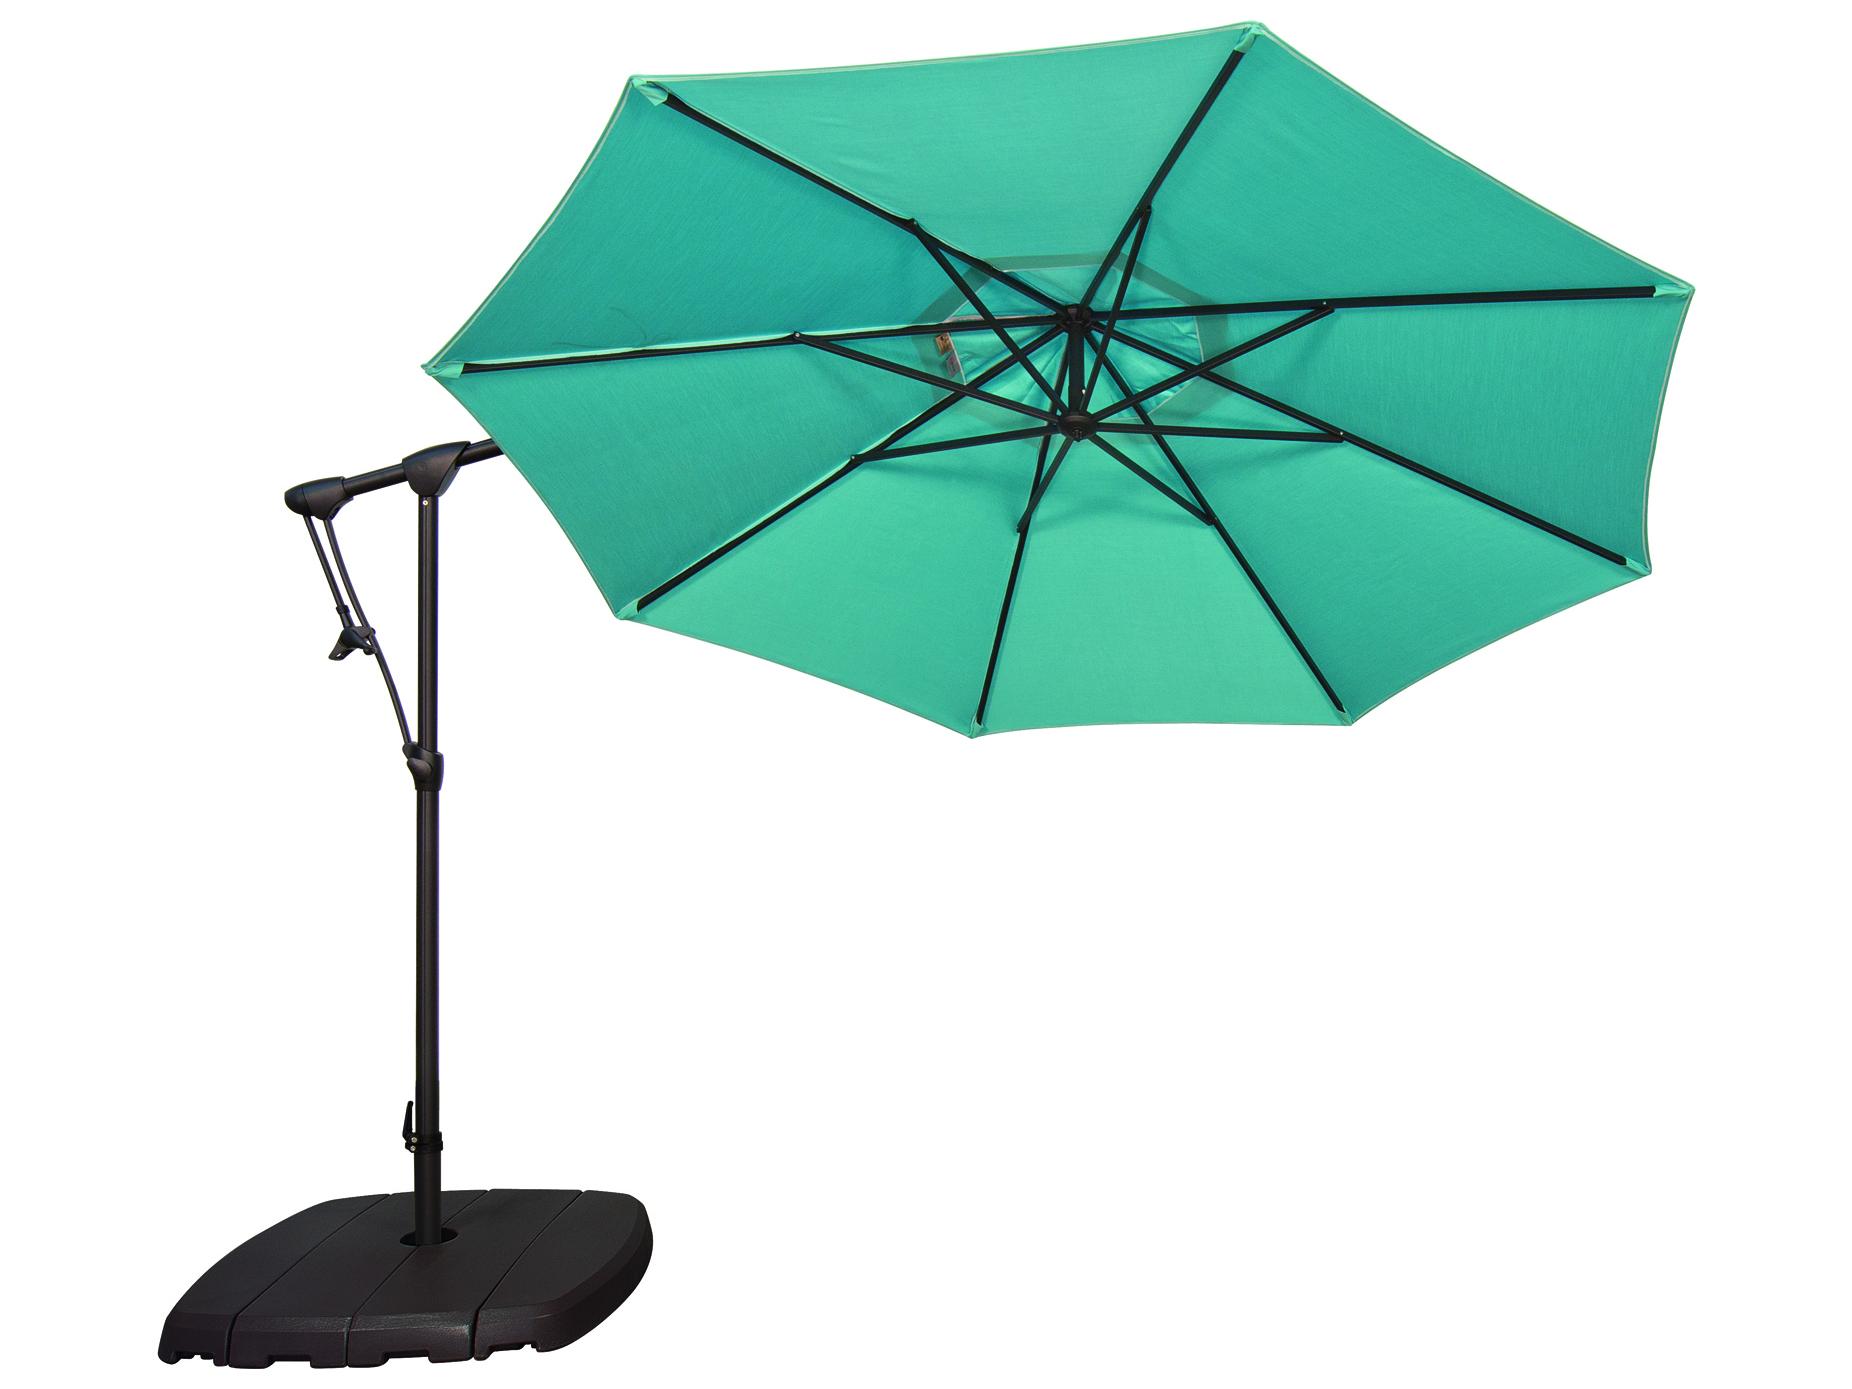 Treasure Garden Cantilever AG19 Aluminum 10' Octagon Tilt & Lock Offset  Umbrella